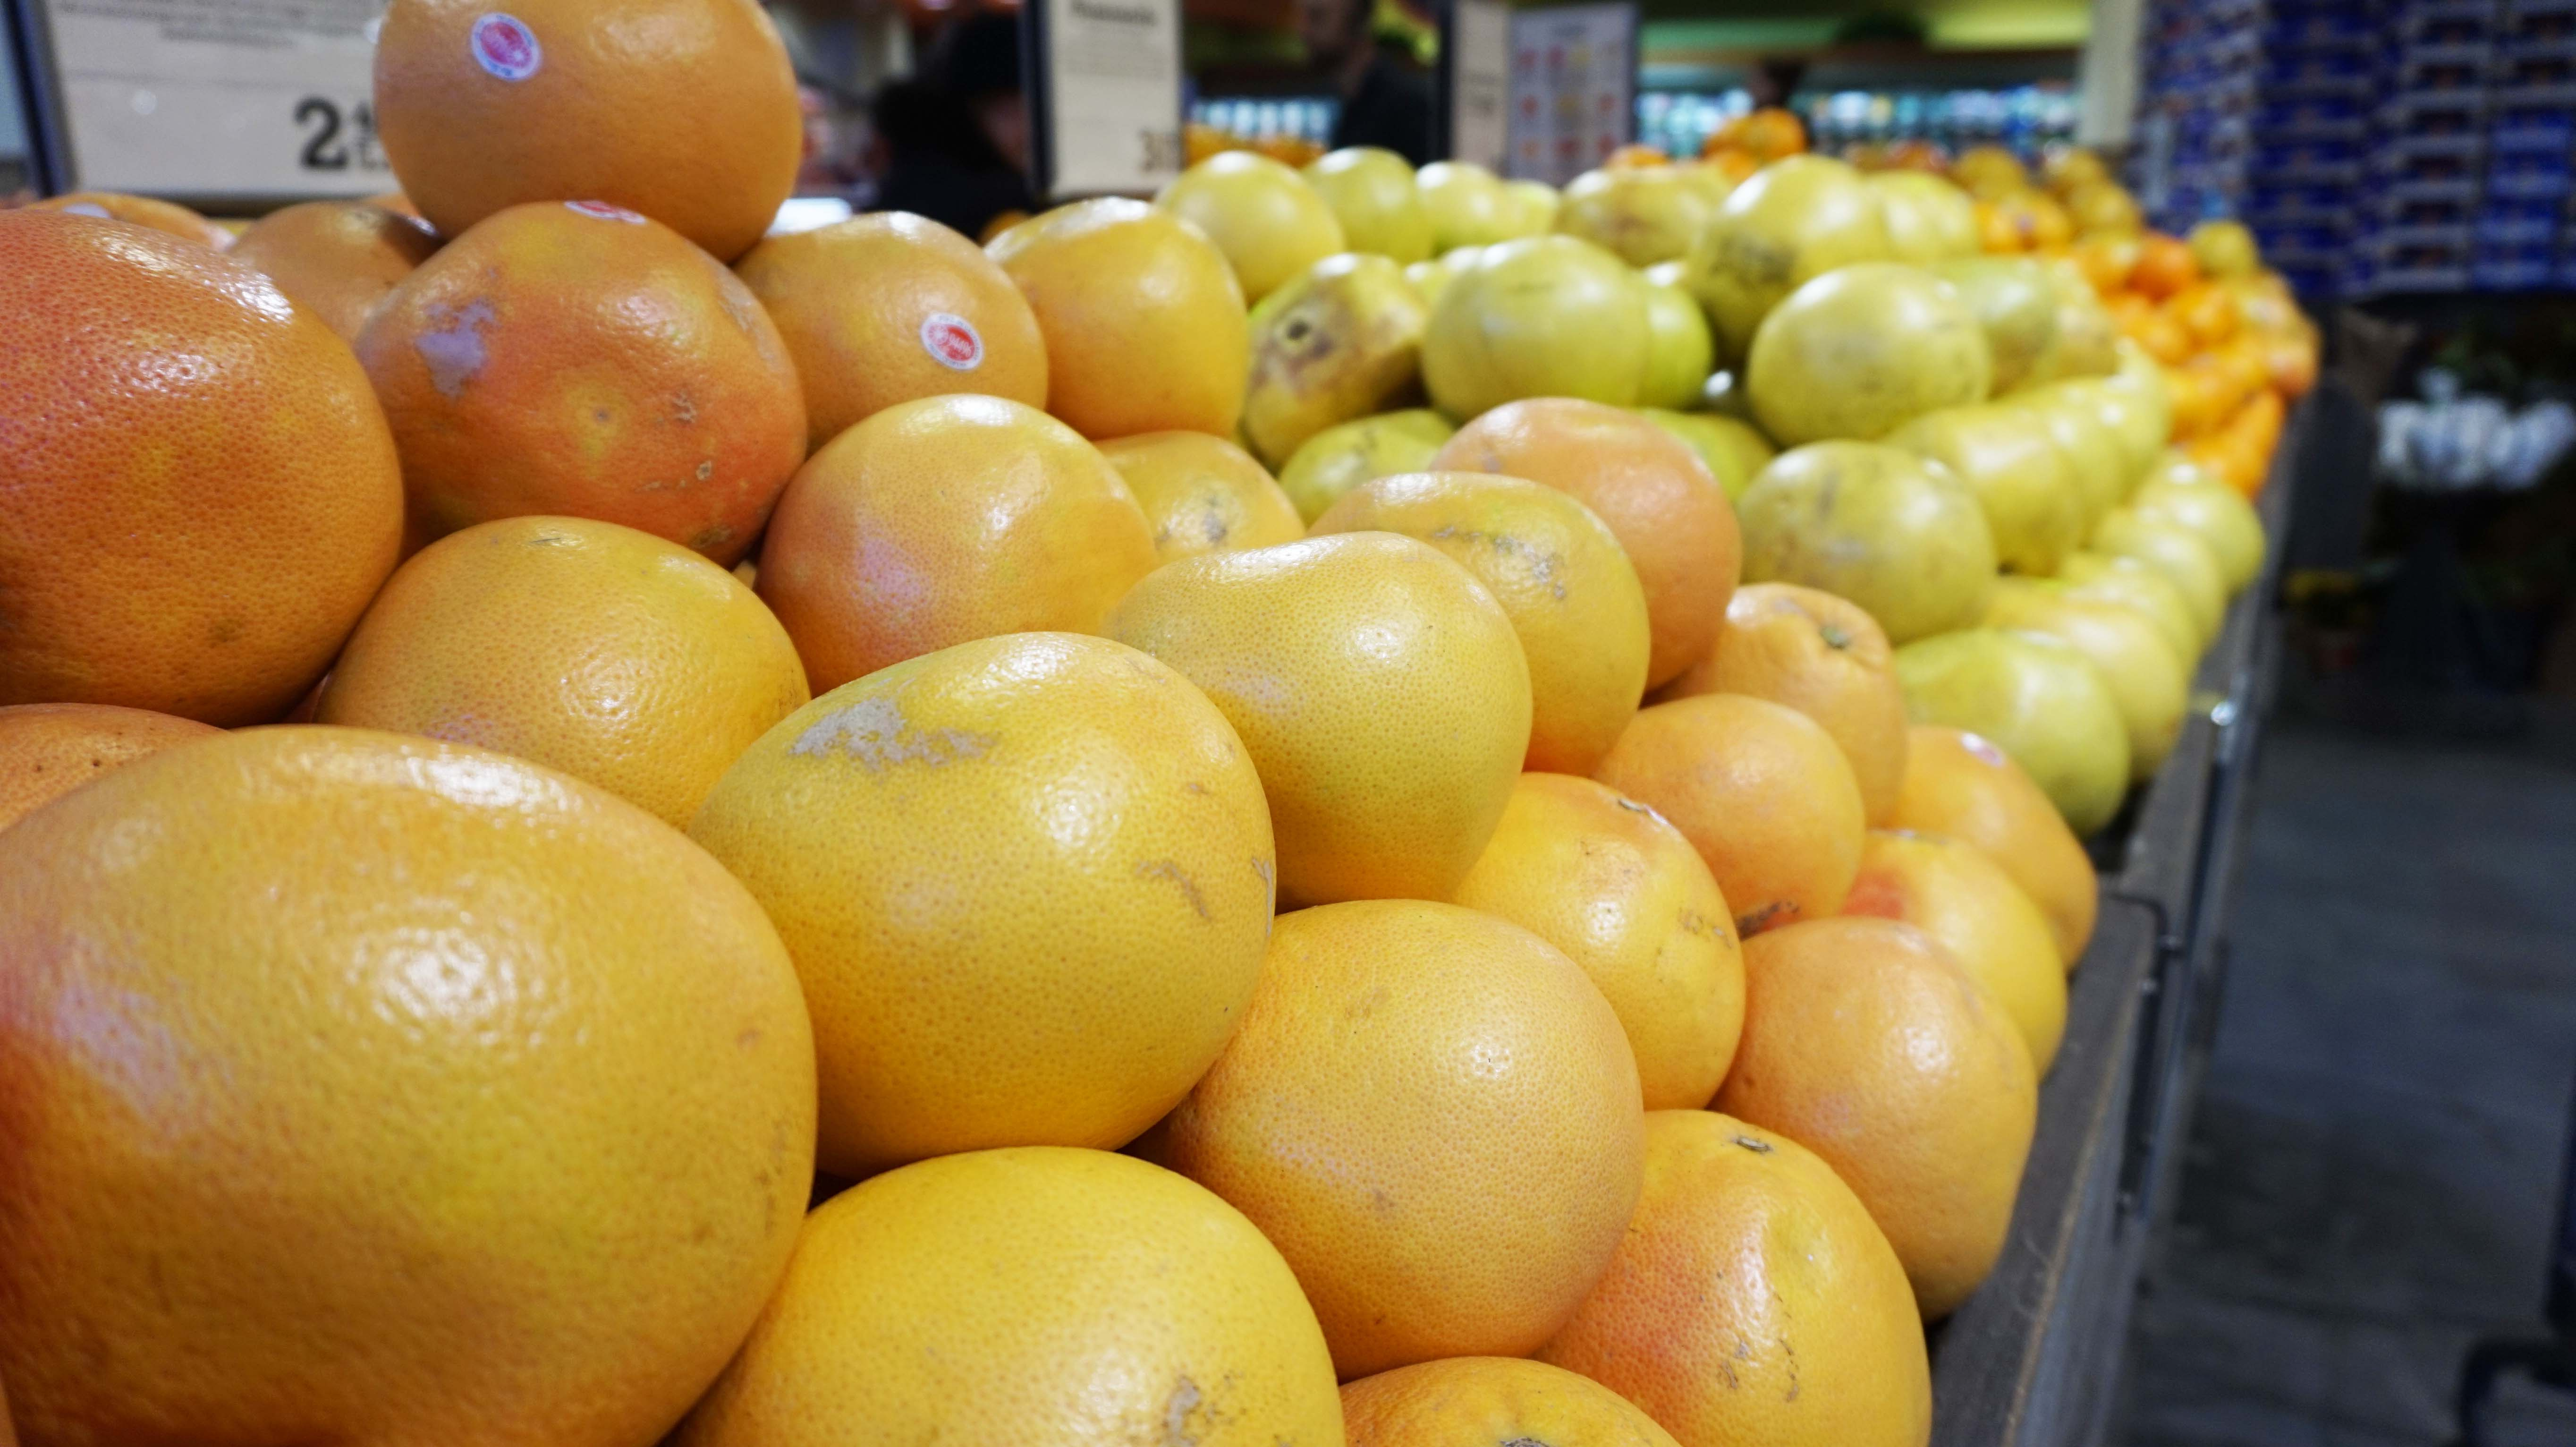 Whole Foods grapefruit